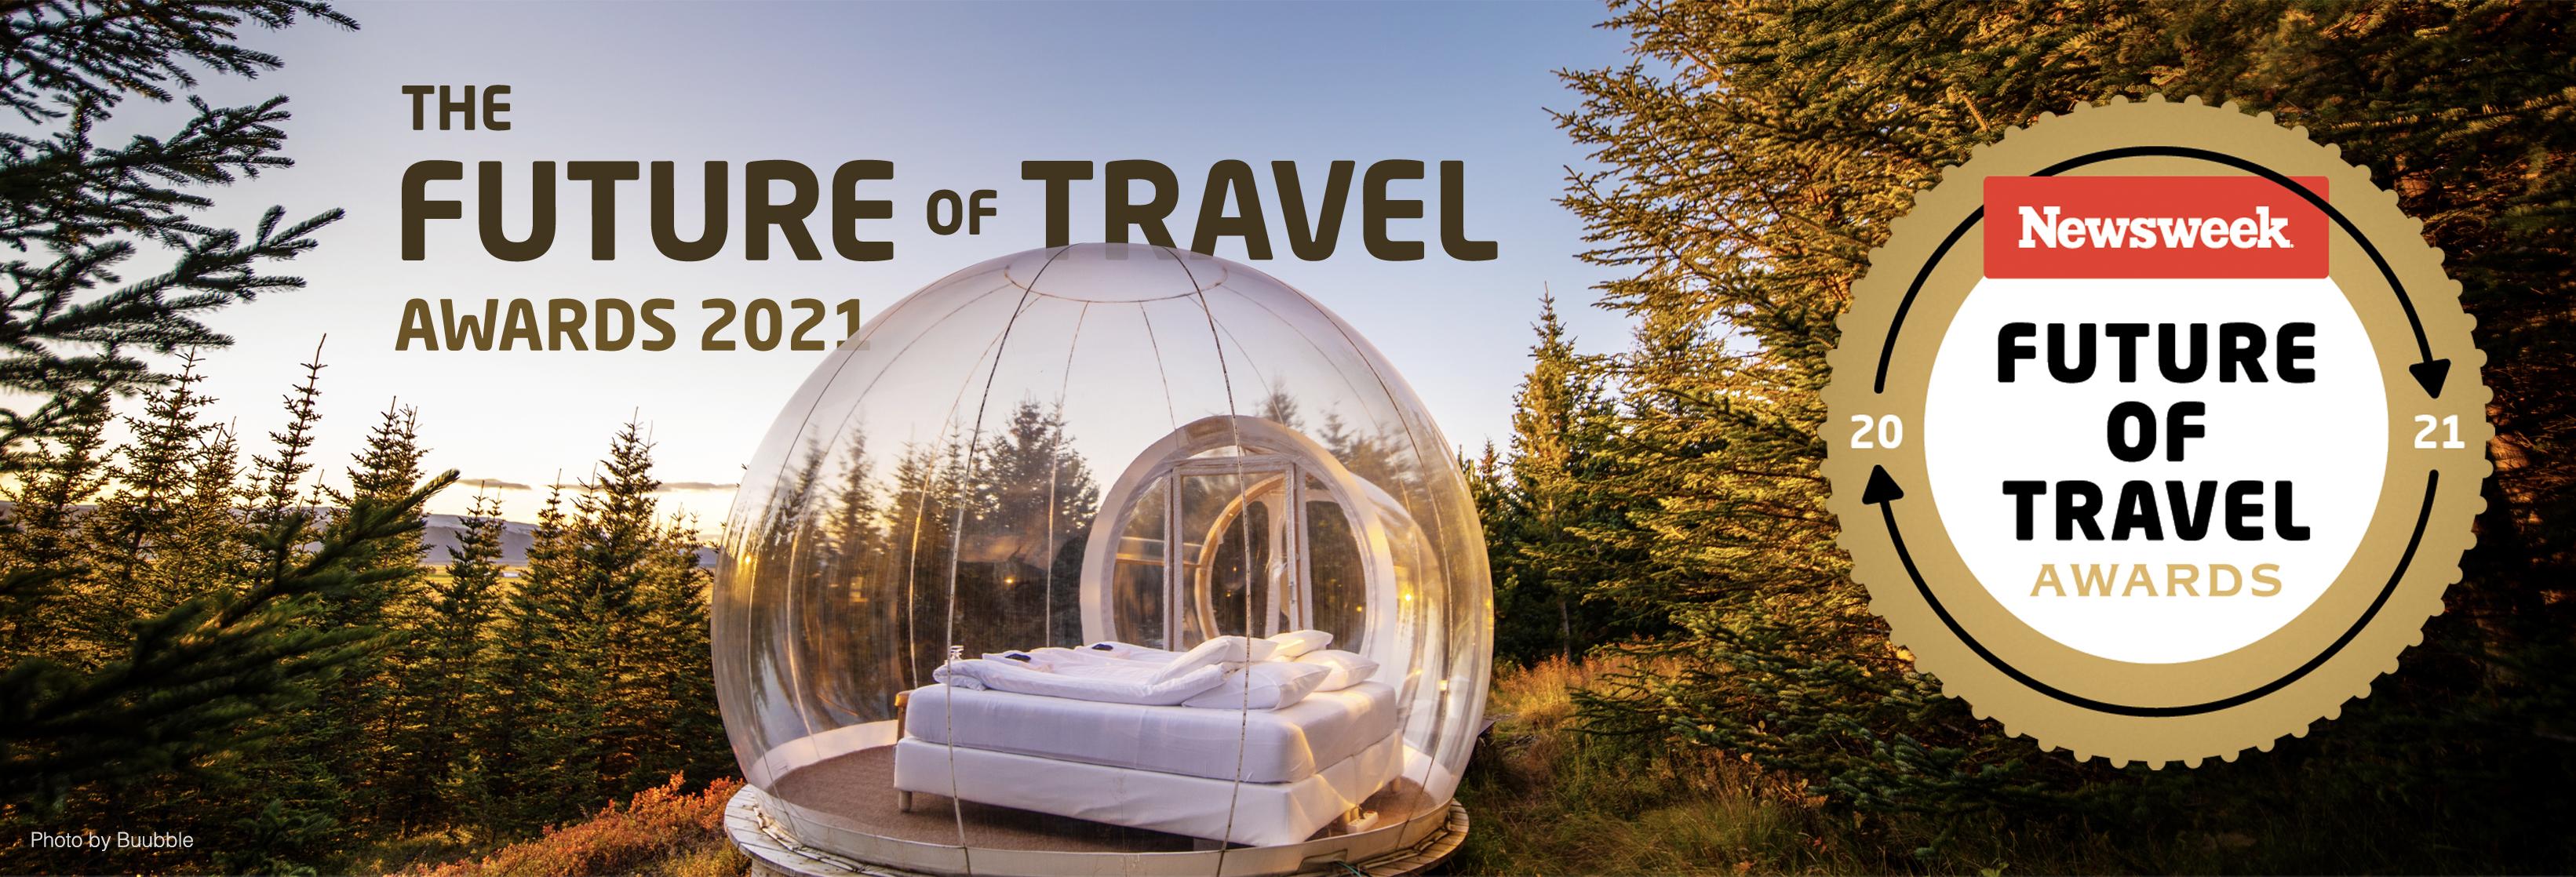 Future of Travel Awards 2021 Bubble 2